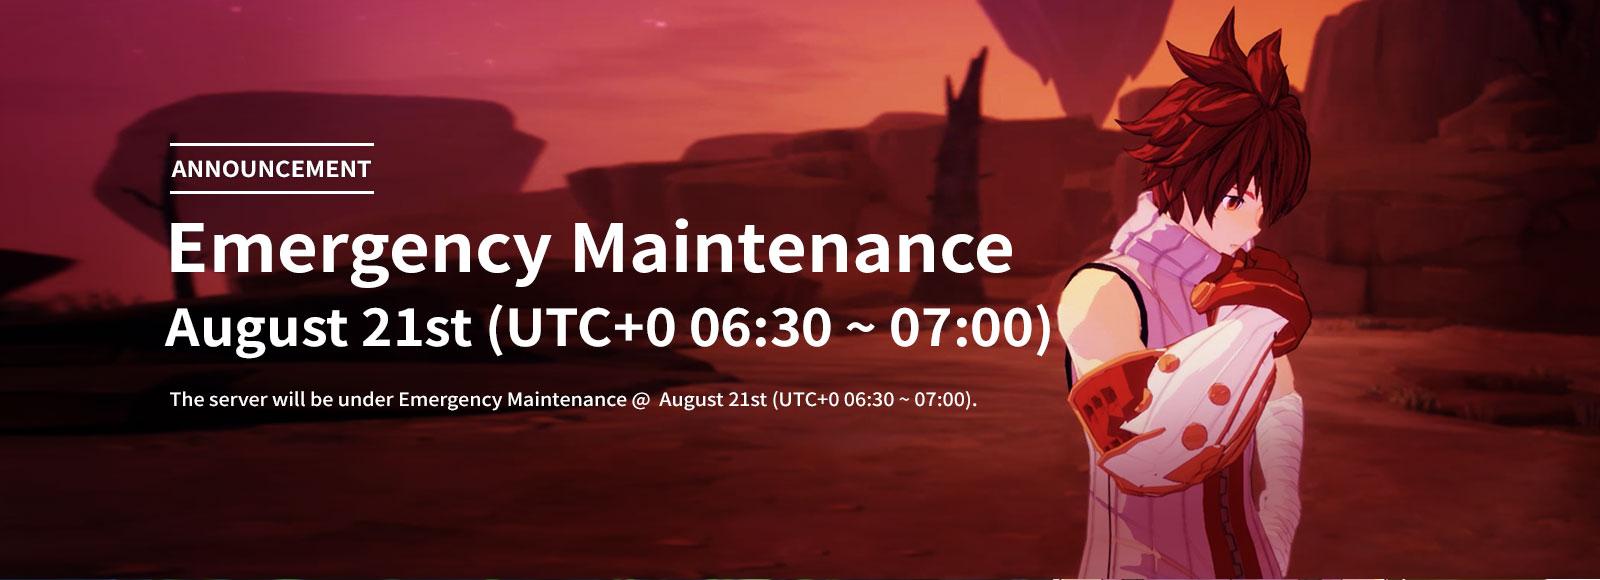 August 21st Emergency Maintenance Announcement